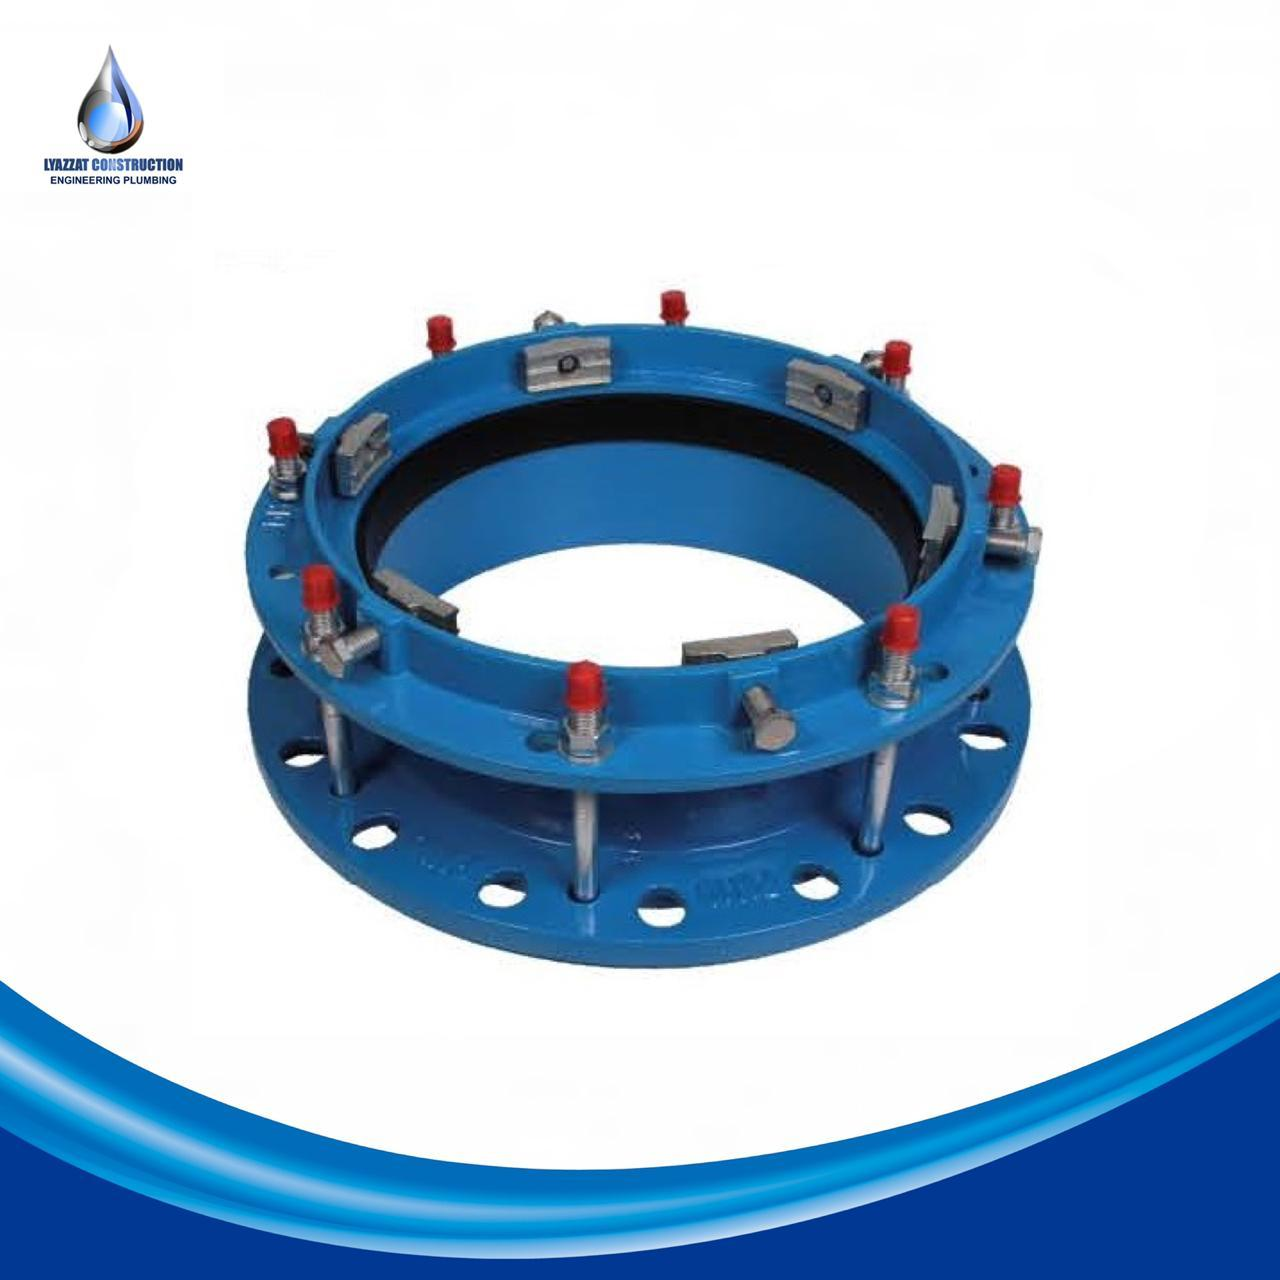 Фланец фиксирующий для ПЭ и ПВХ труб DN 200/250 PN10-16